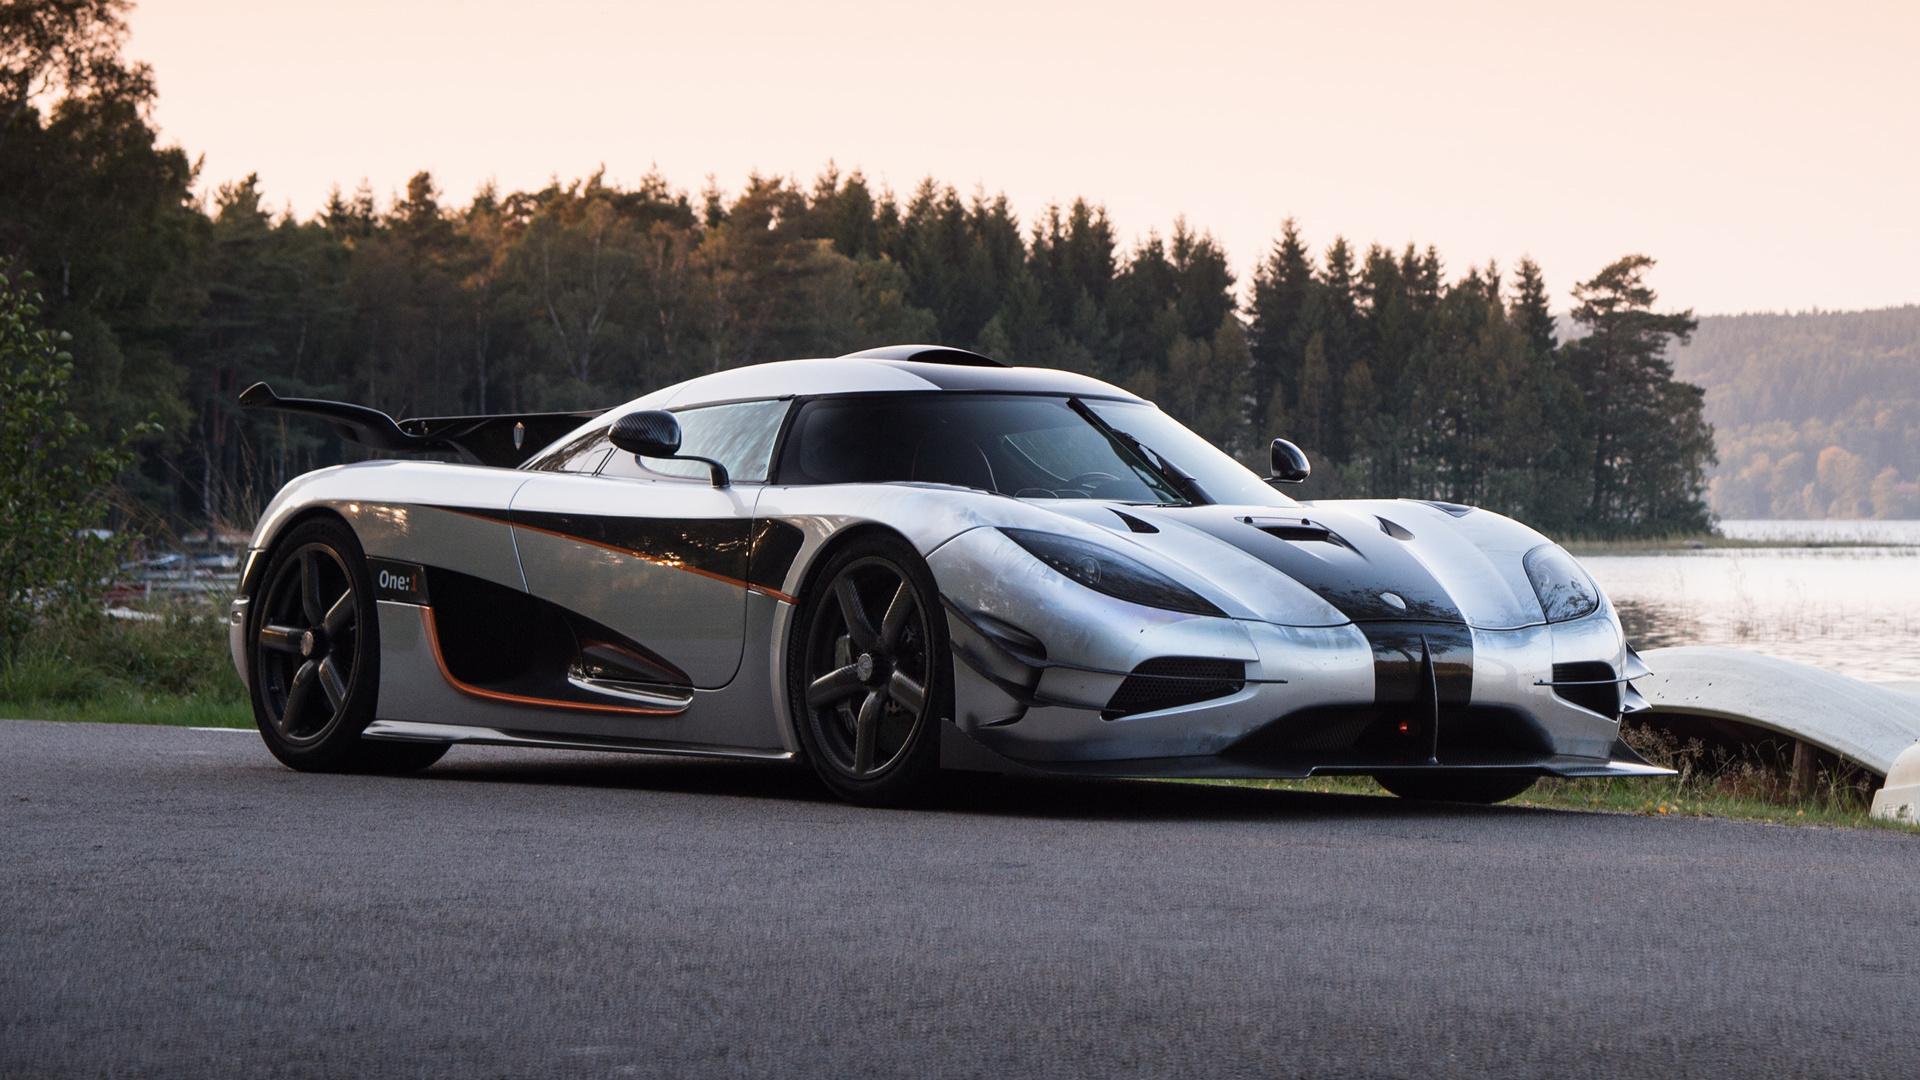 Veneno Hd Wallpaper The Top 10 Most Expensive Cars Gazette Review